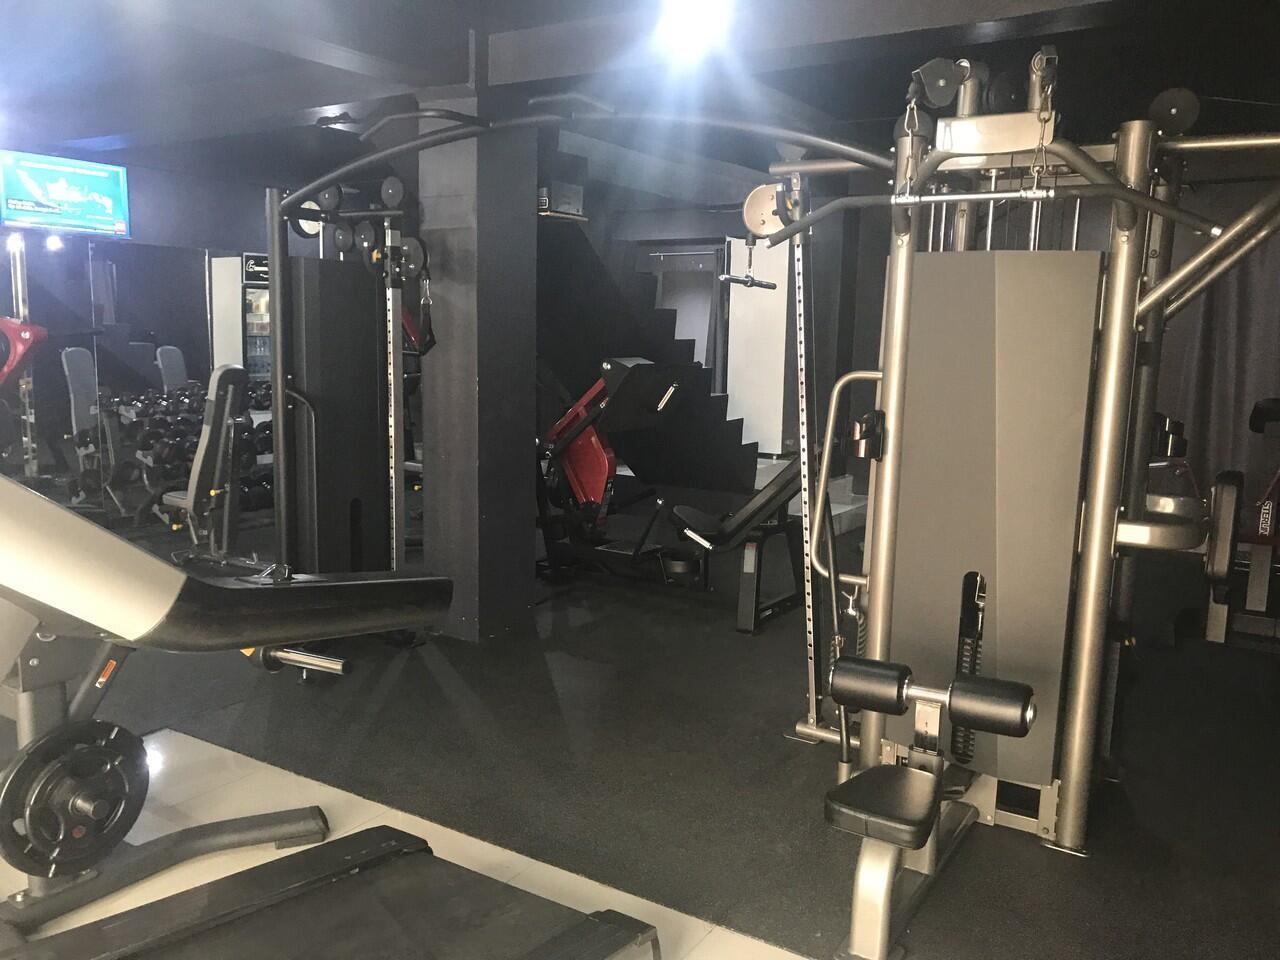 Tempat daftar harga fitness donk page kaskus